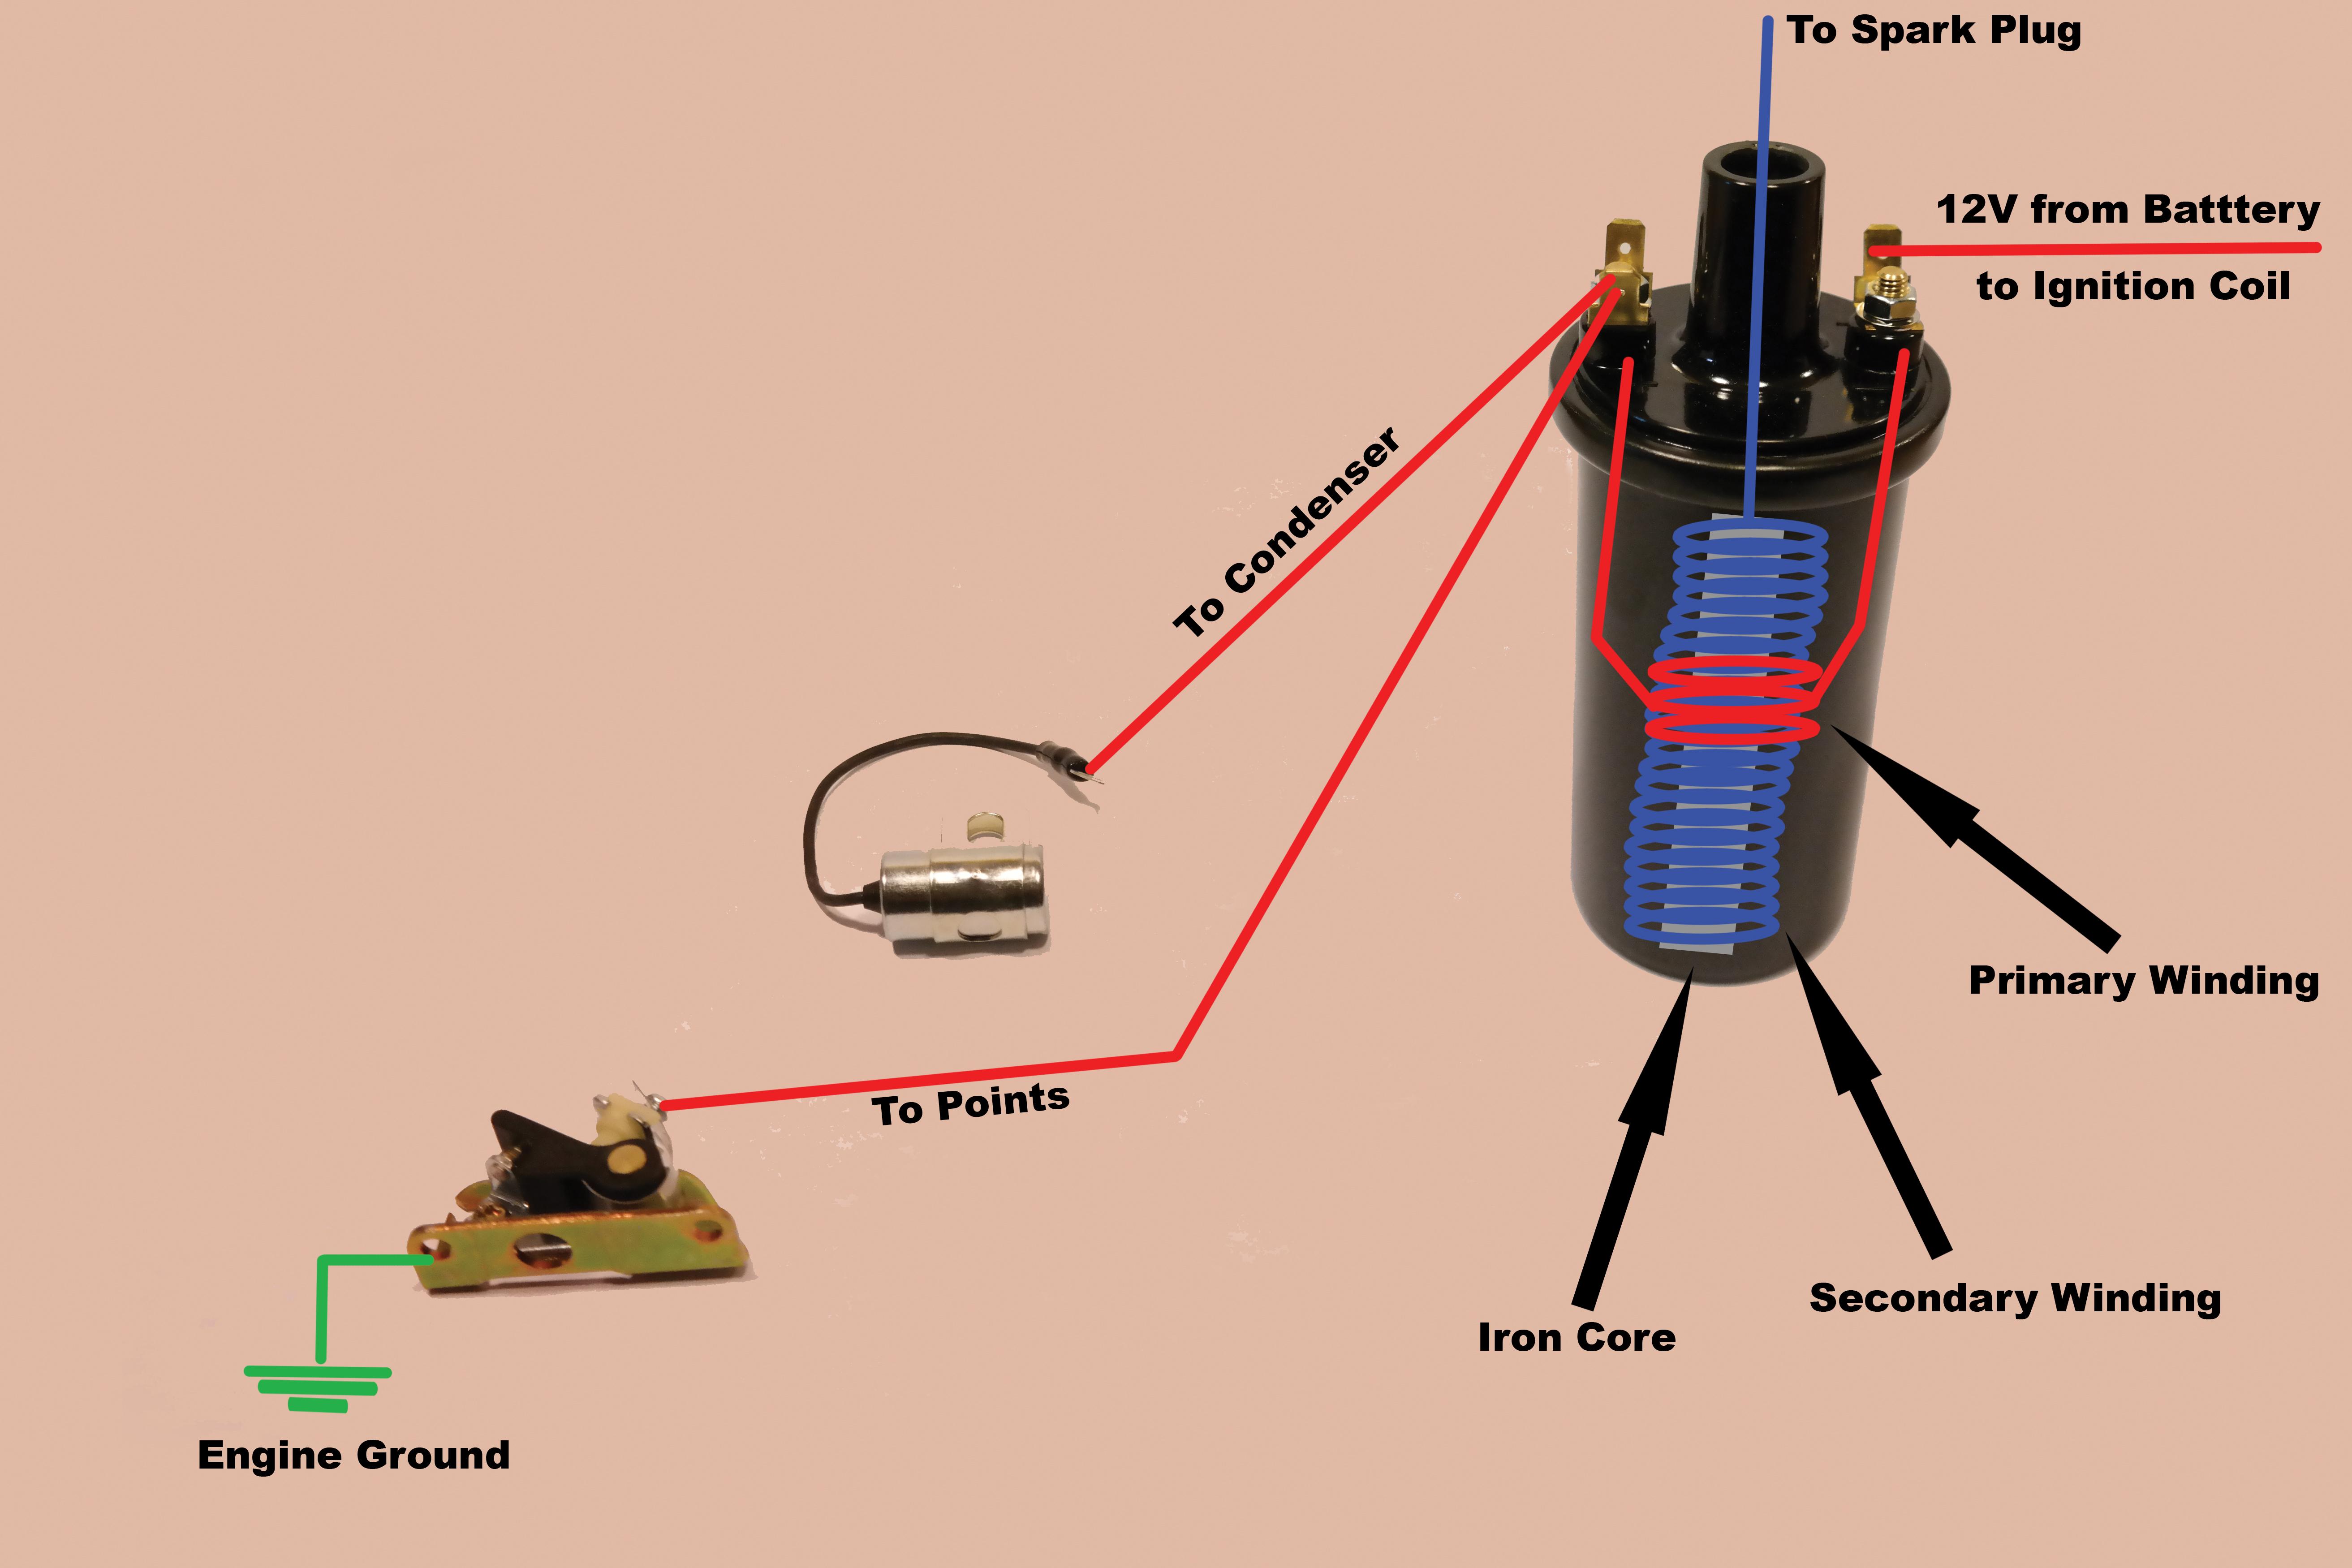 Diagram Understanding Your Battery Ignition System On Your Kohler